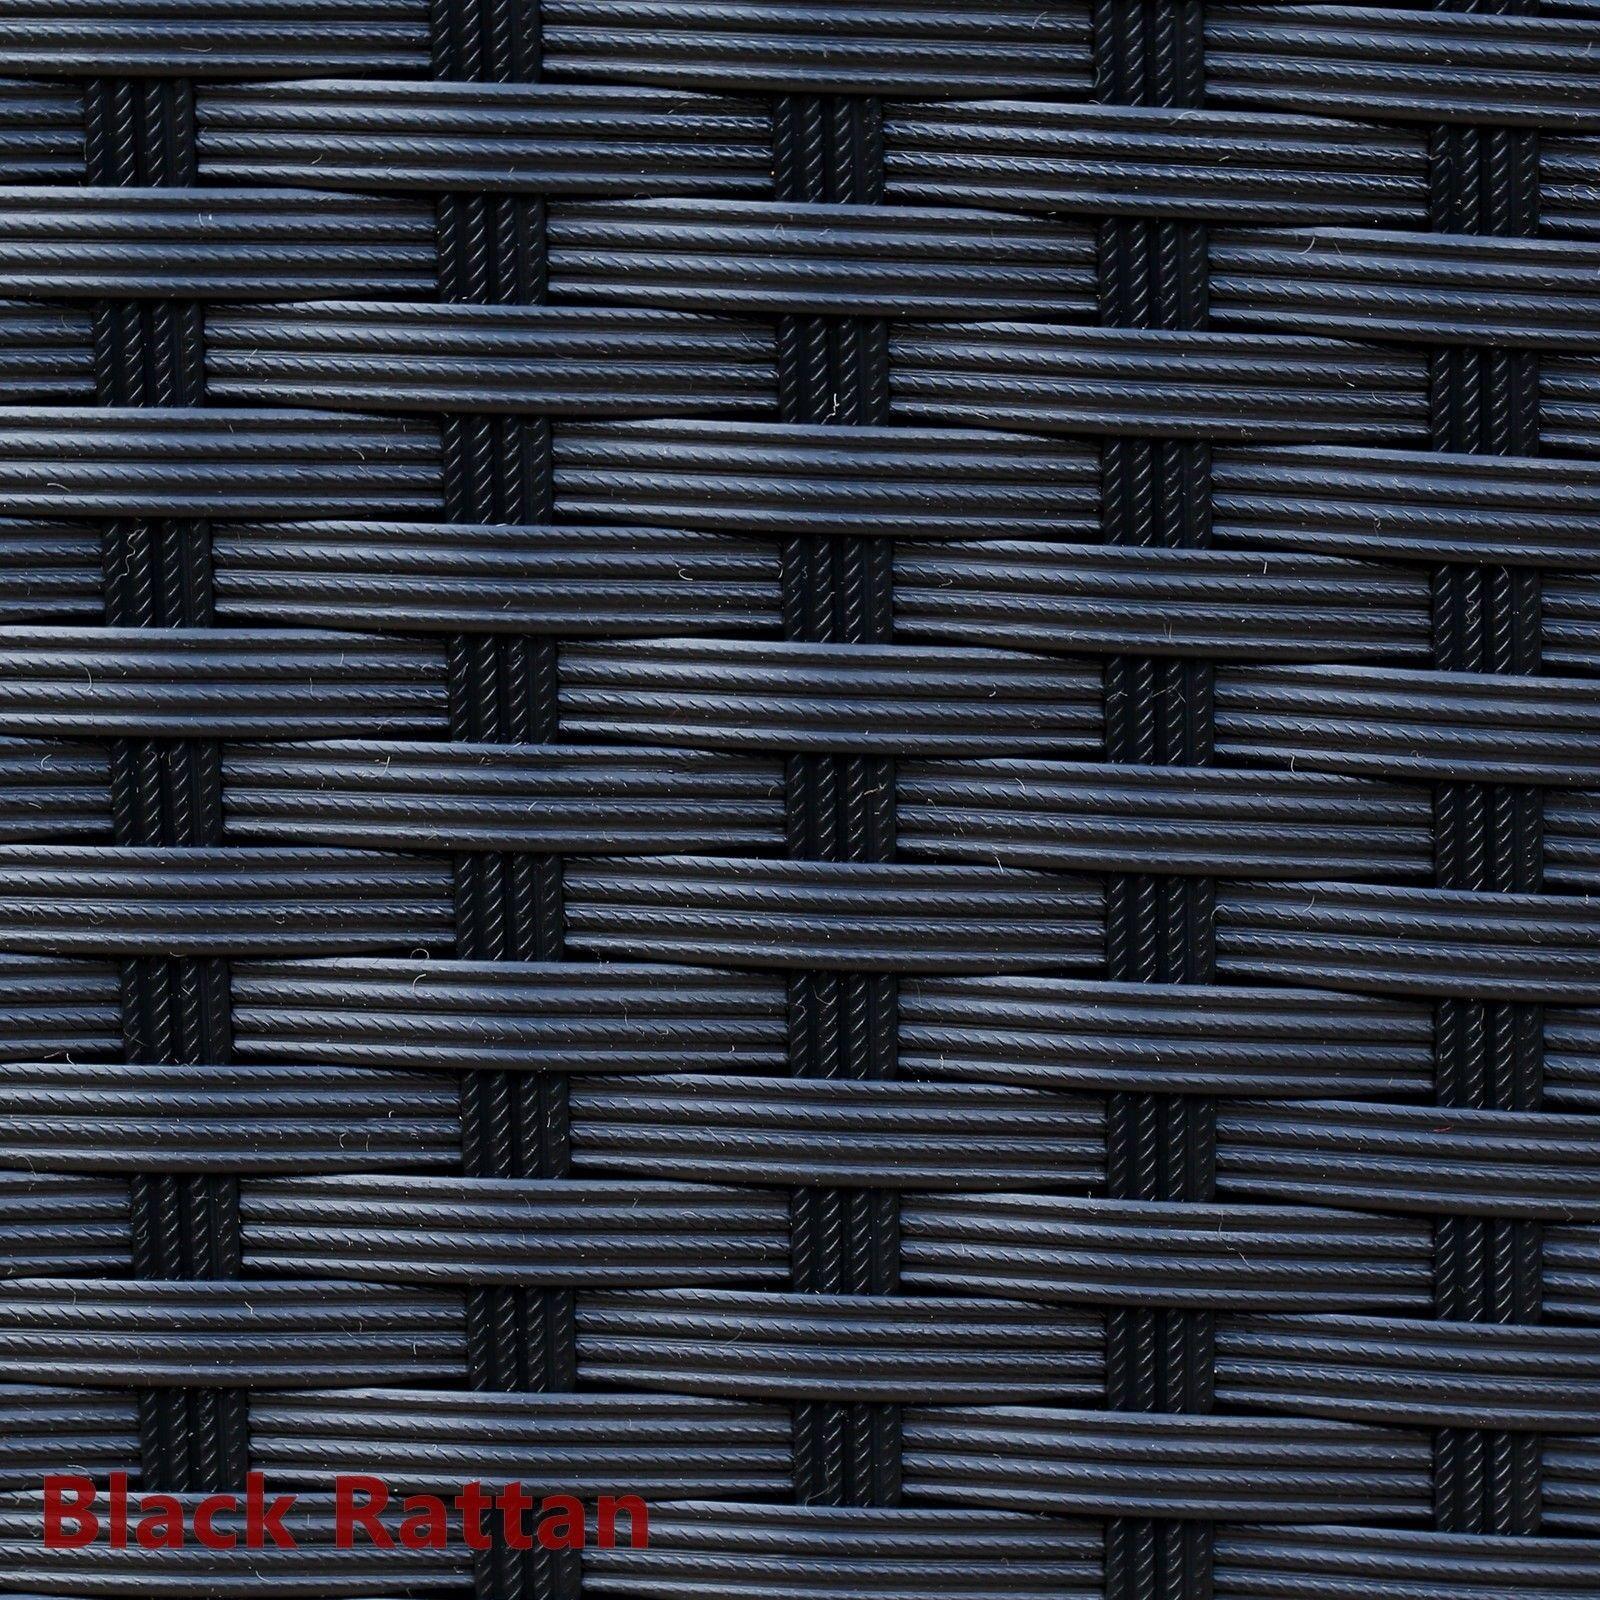 Black Rattan Sofa & Stool Set Modular Outdoor Garden Furniture Dark Cushions New image 4